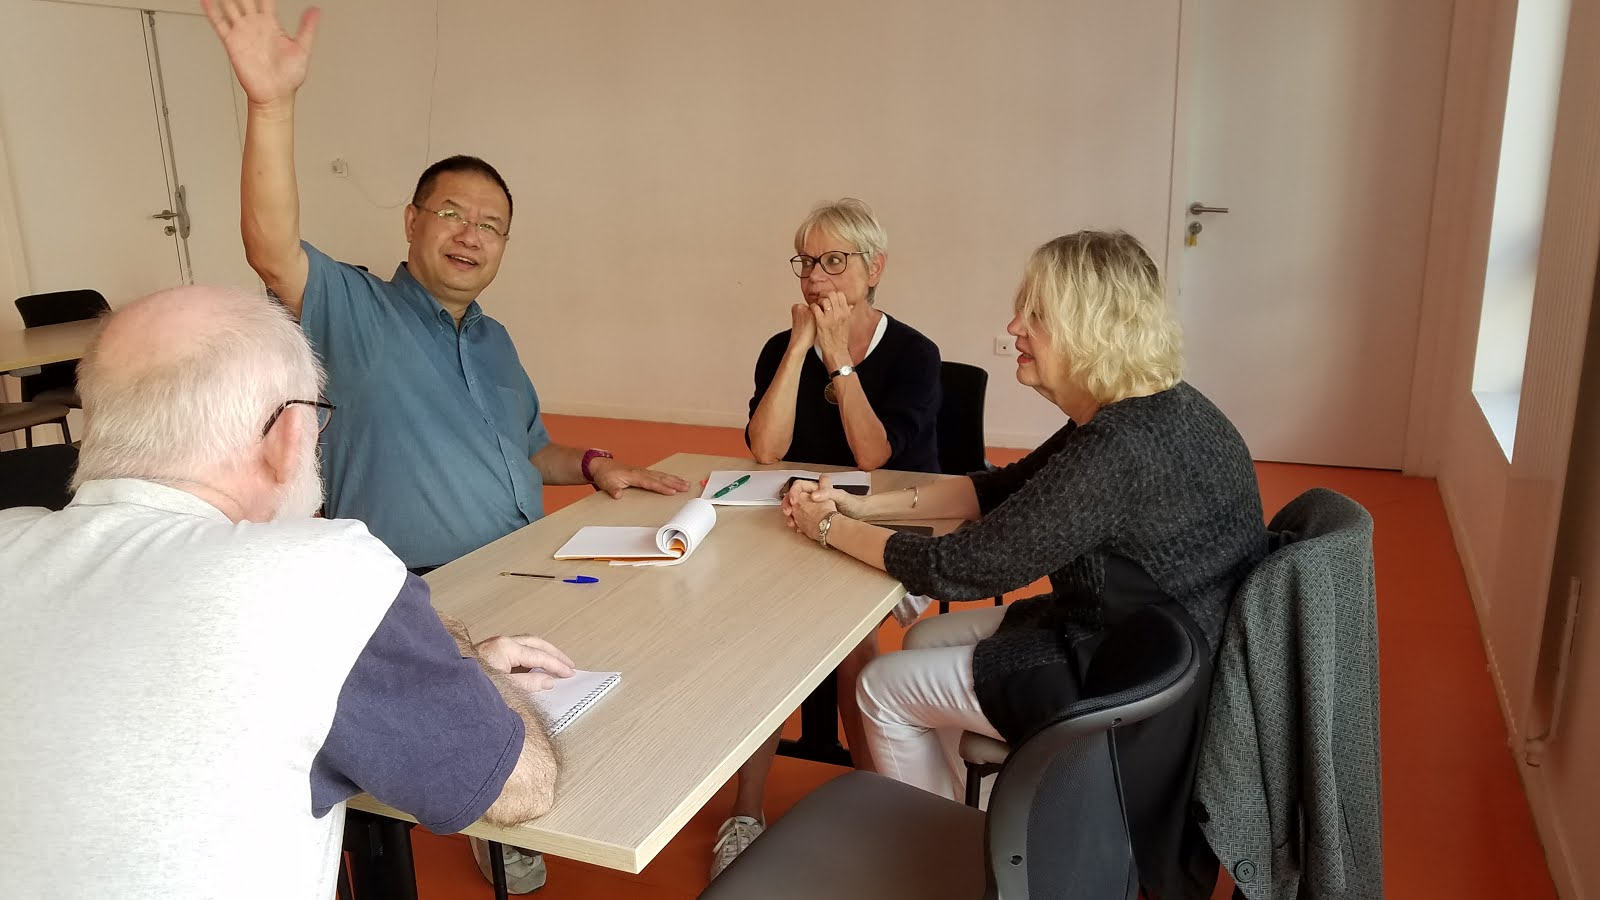 Practice Your Language Skills, Meet New Friends